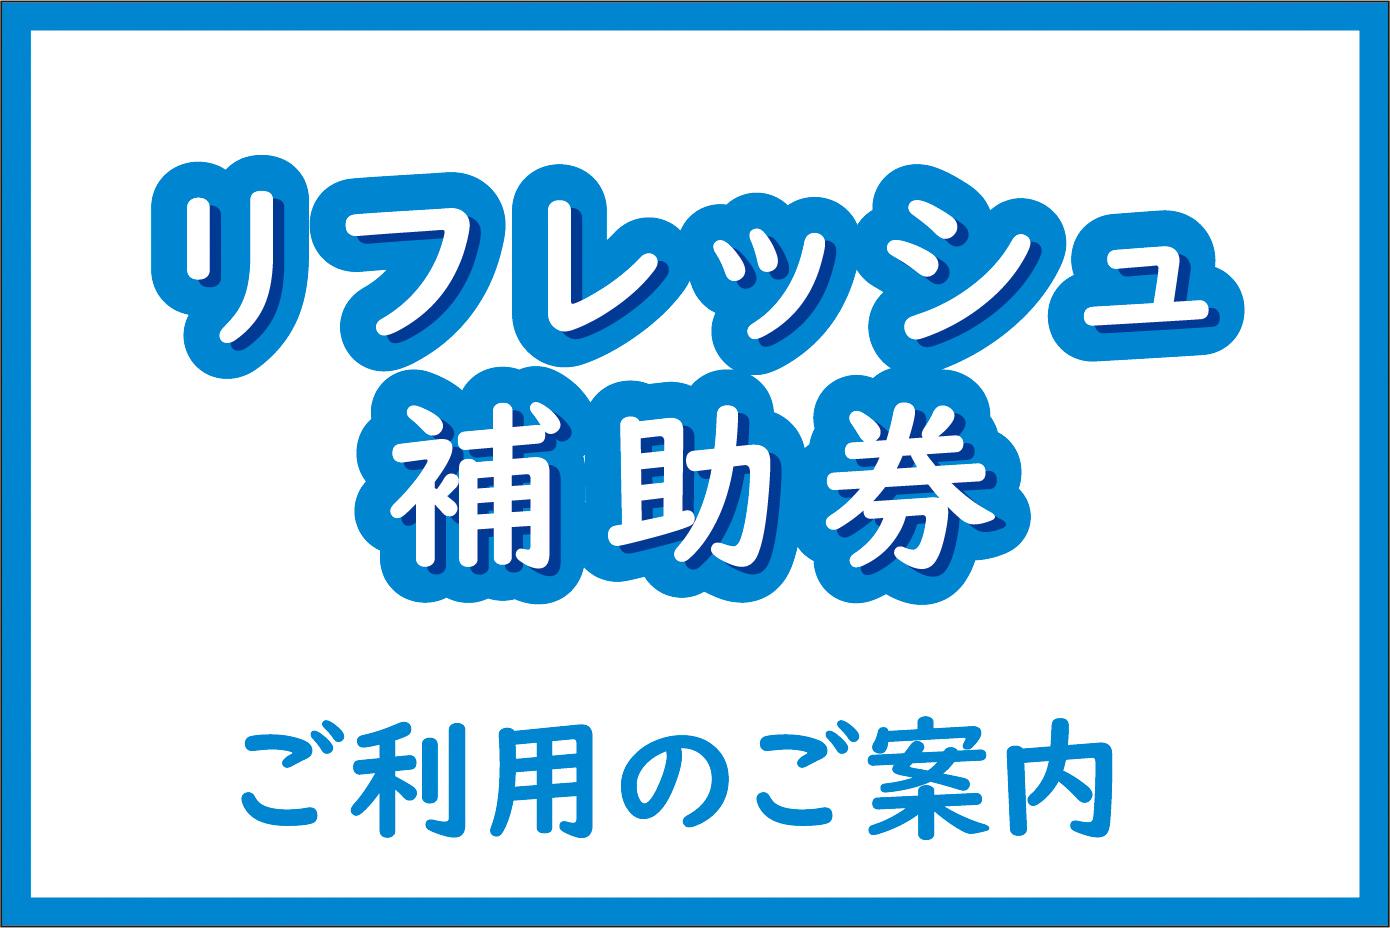 [Shin-Yokohama Grace hotel] You can use refresh auxiliary ticket of Yokohama city school staff of a school mutual aid society